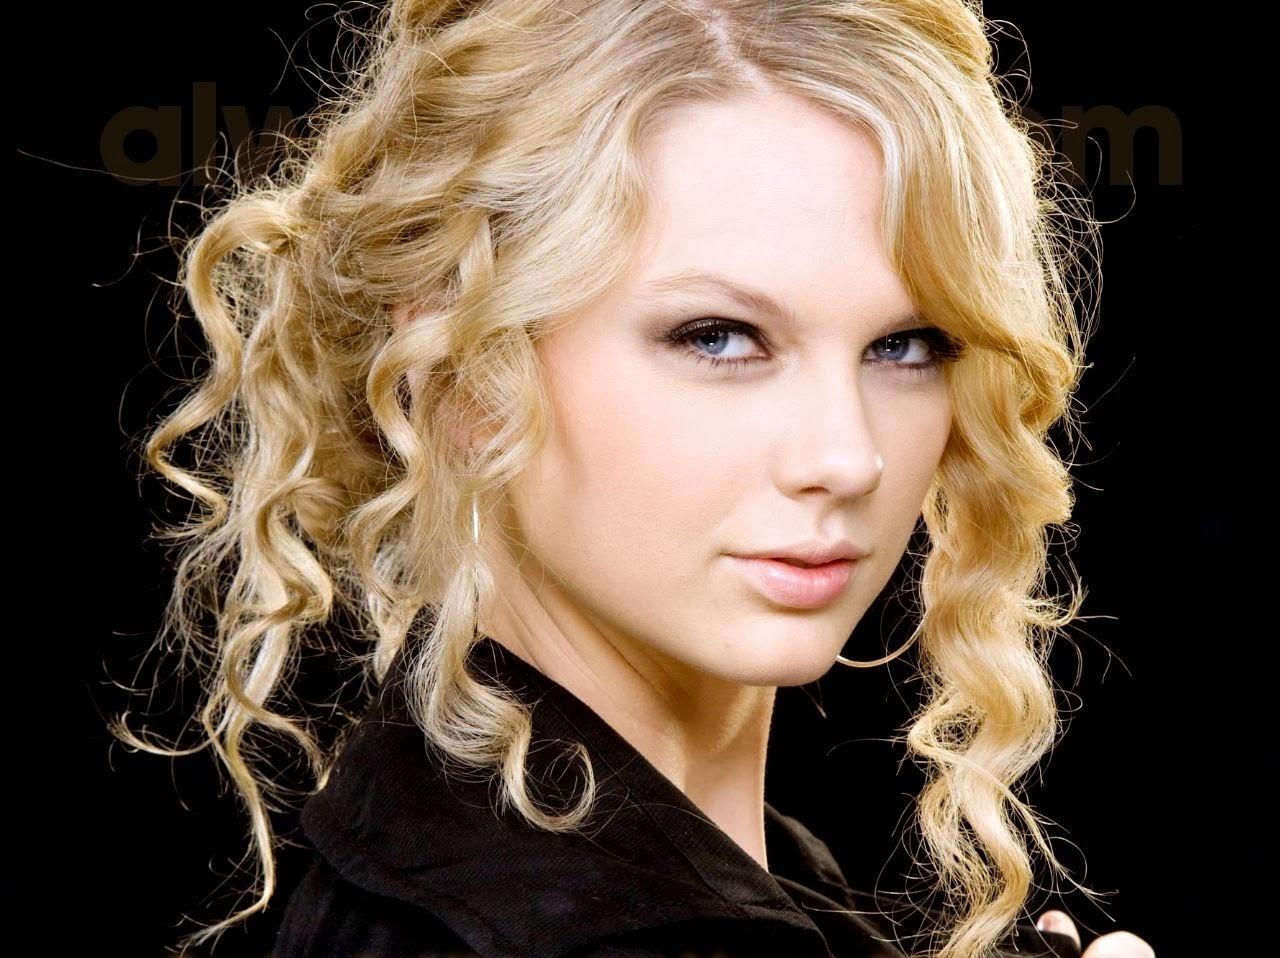 Taylor Swift is looking Seziling